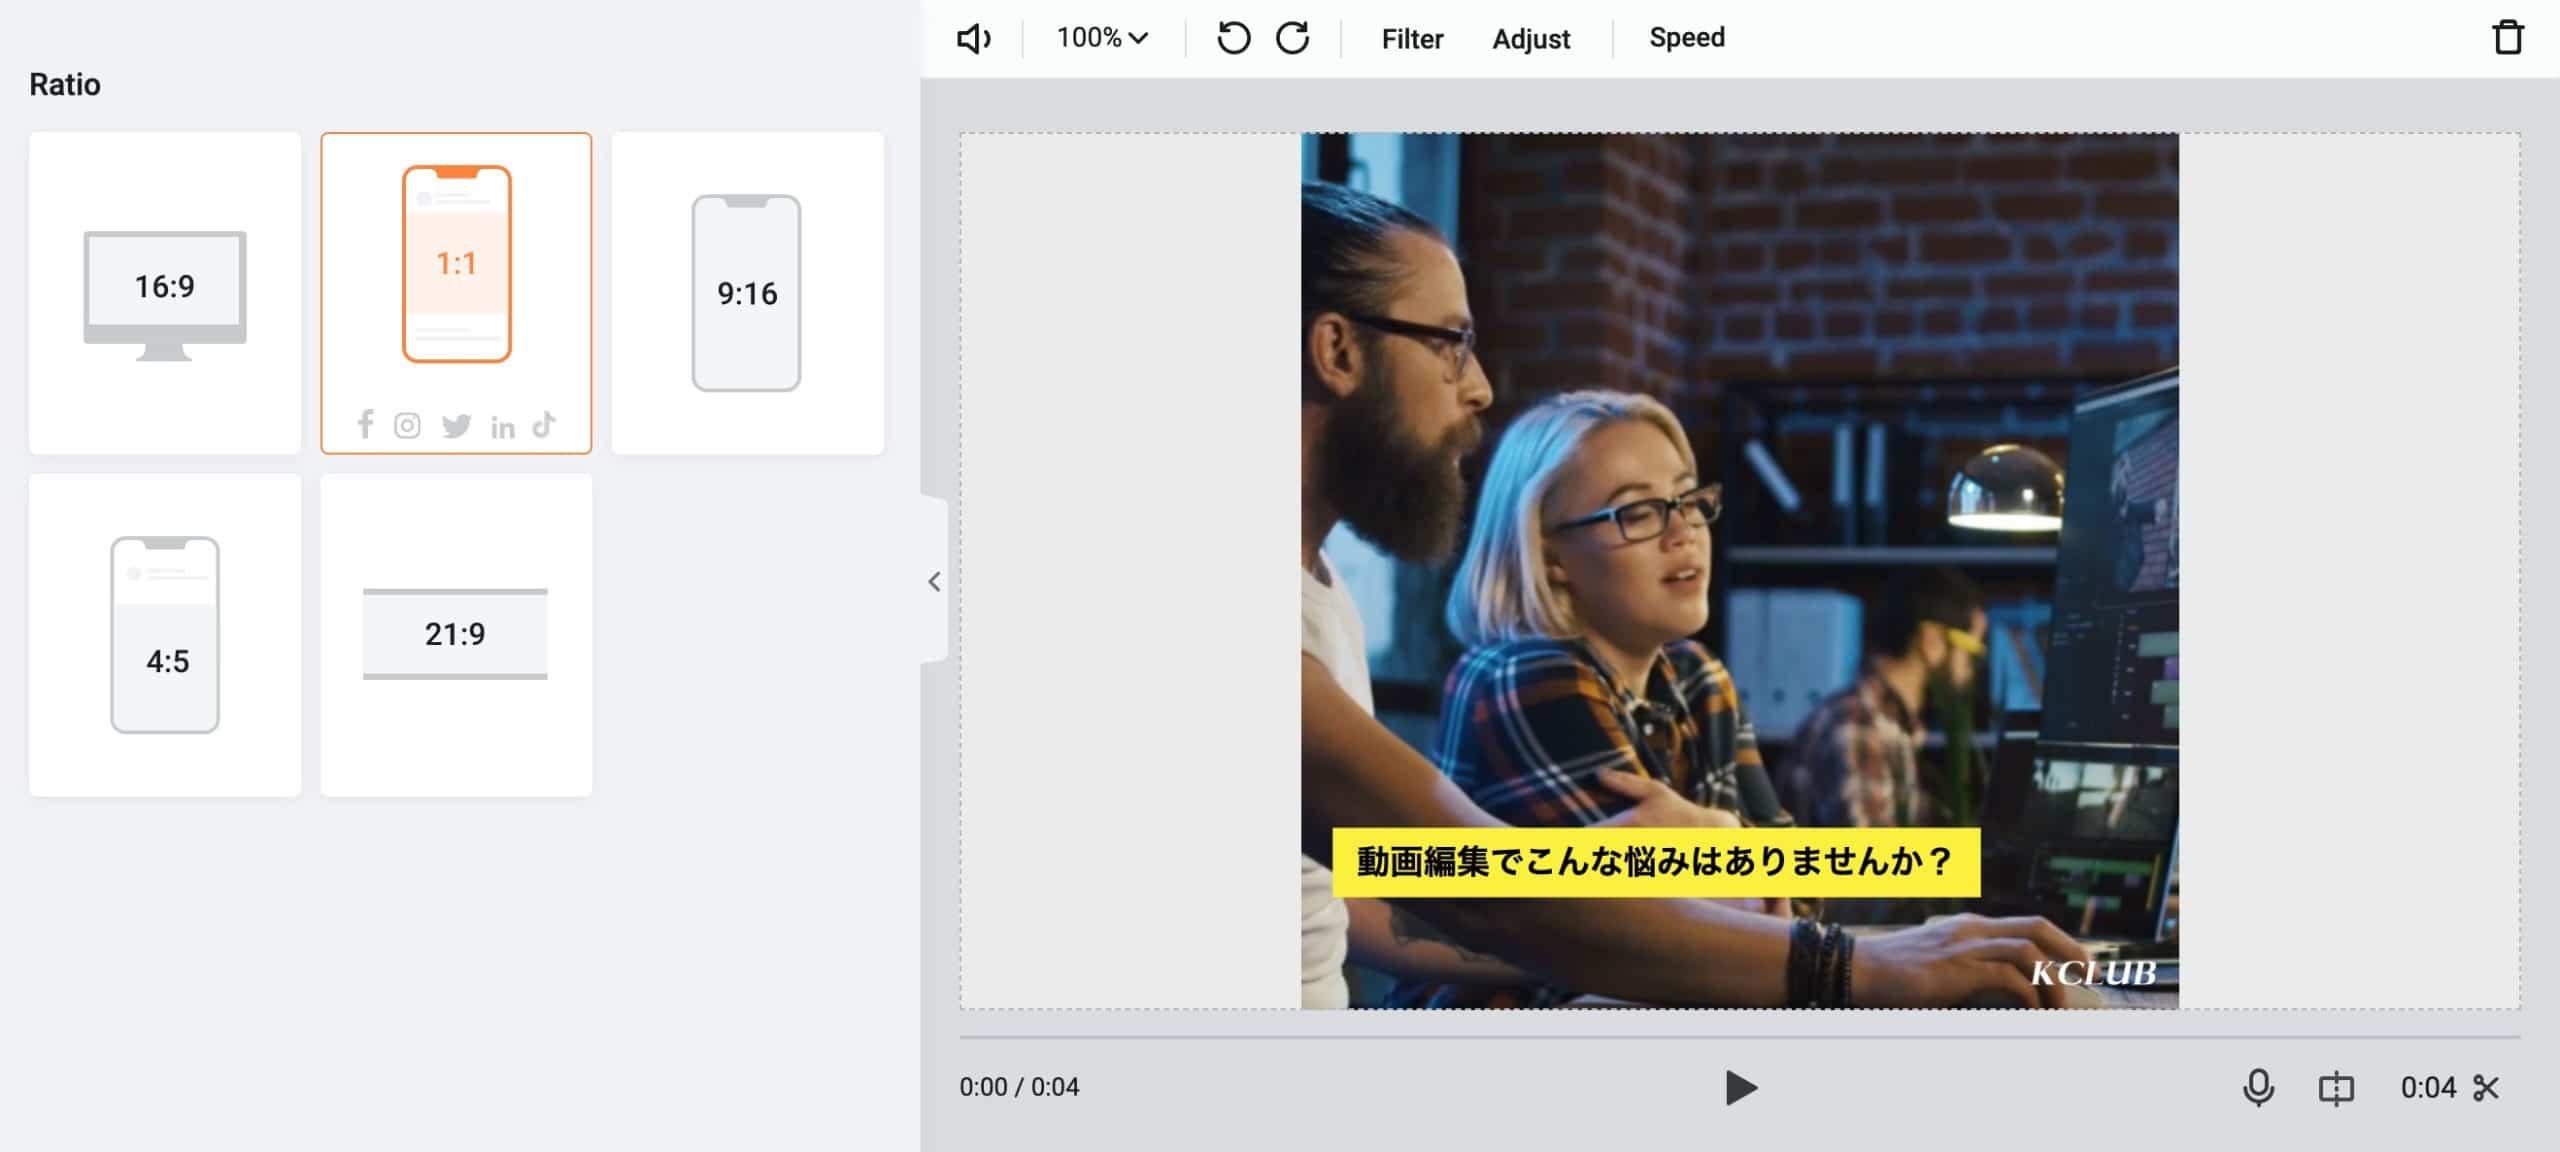 FlexClipで画面の大きさを変更 scaled